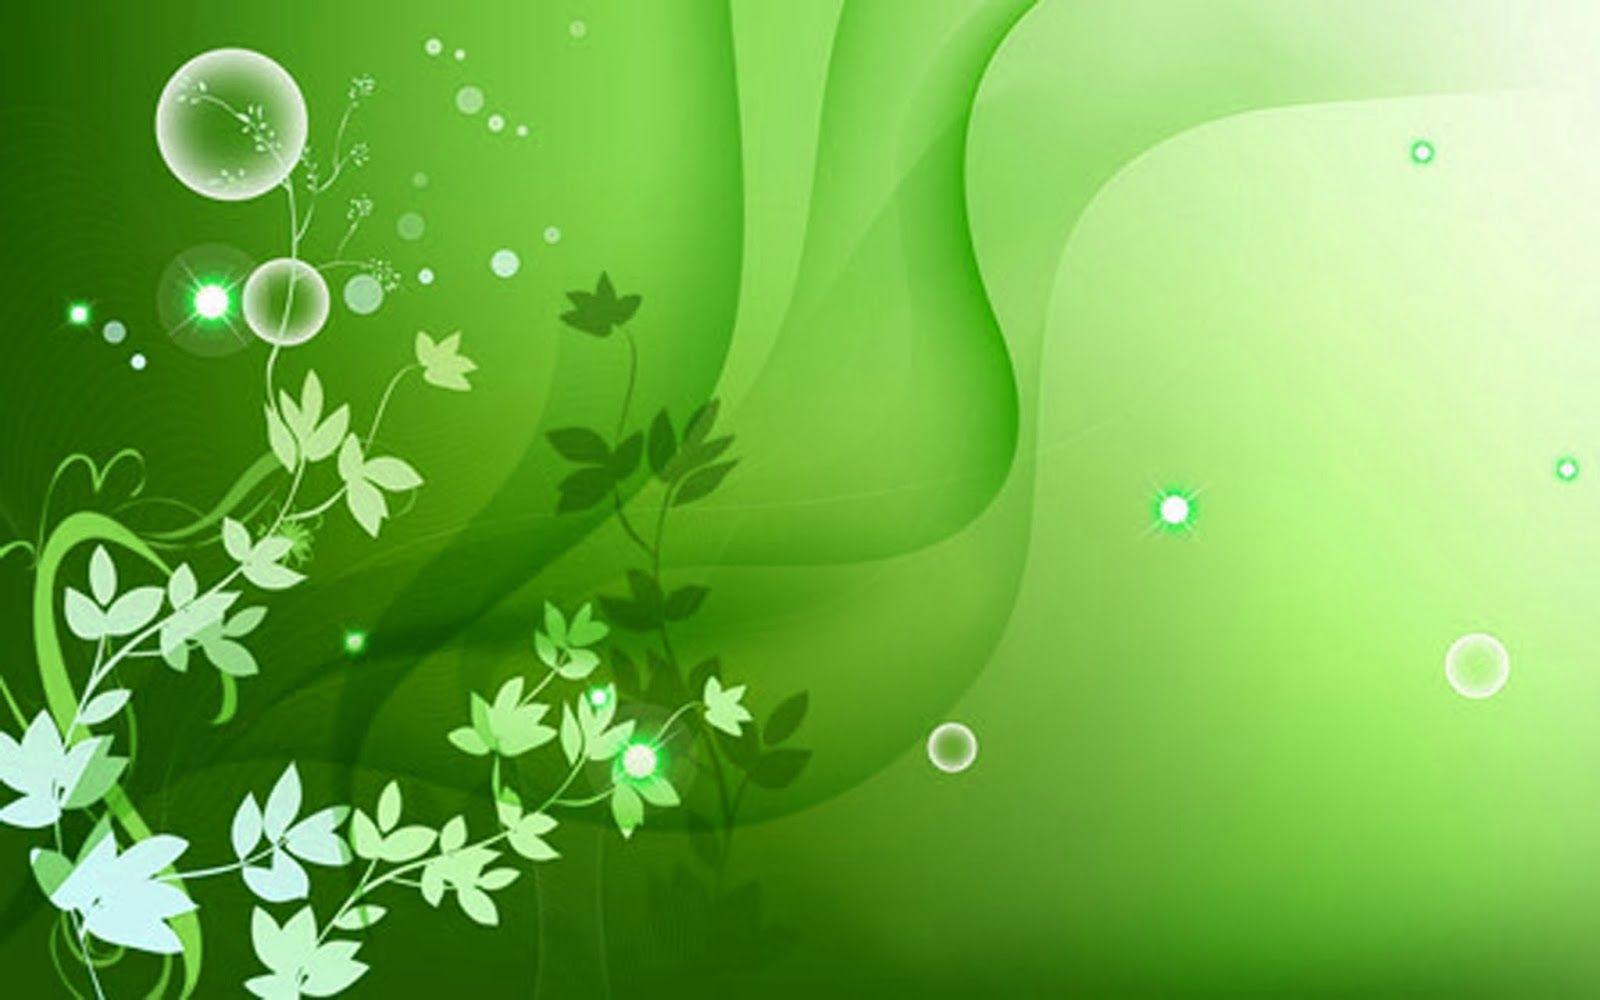 Green Color Wallpapers Wallpaper Cave